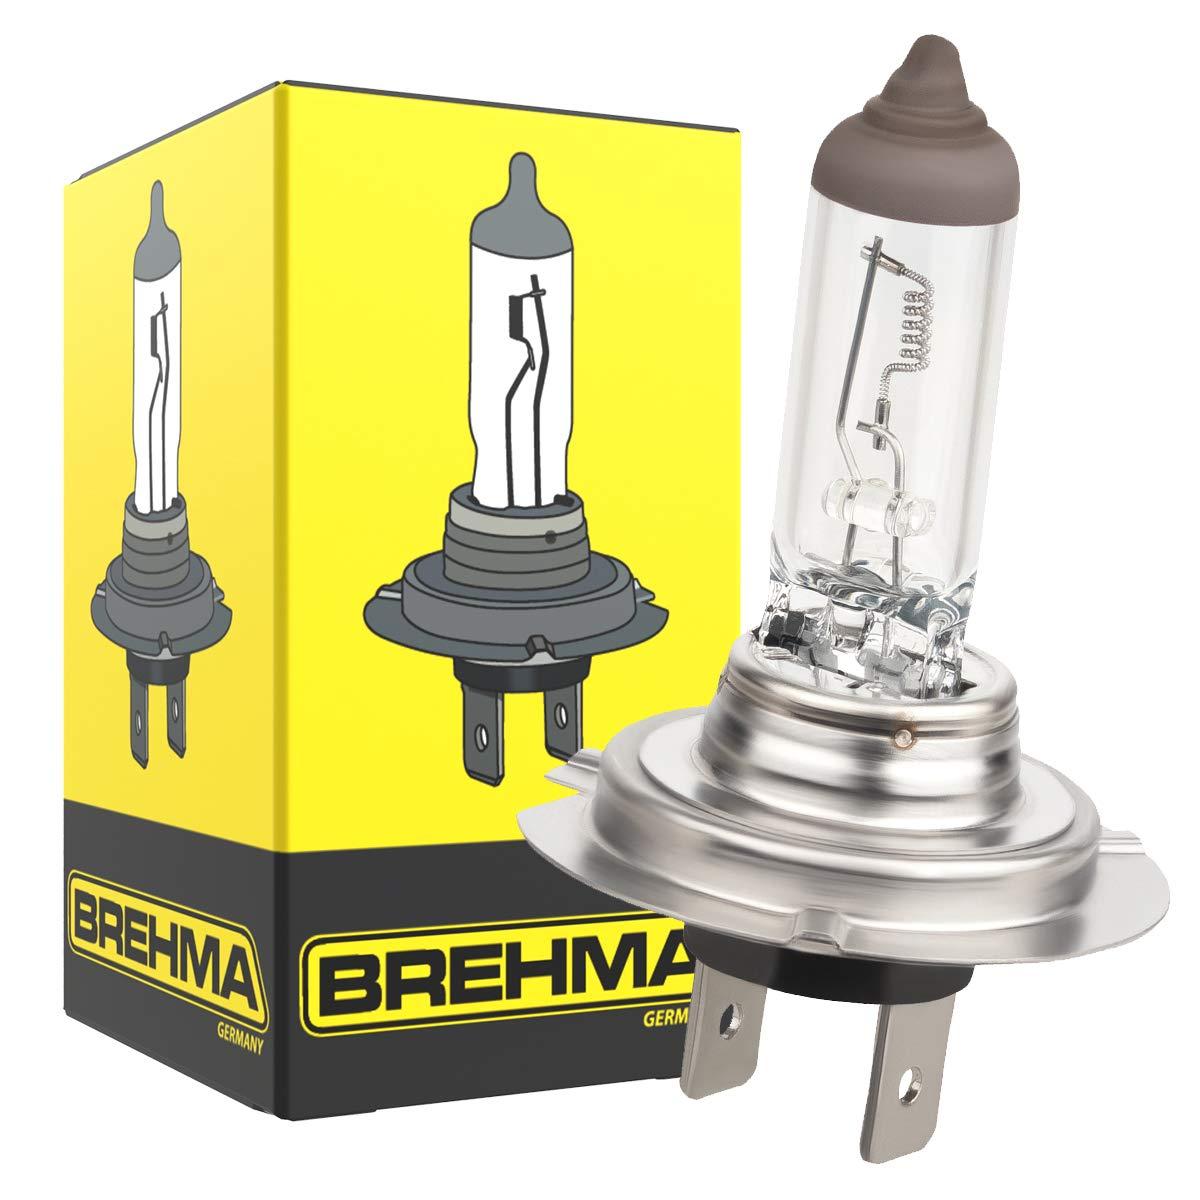 Brehma H7 70 W 10 unidades 24 V L/ámparas hal/ógenas